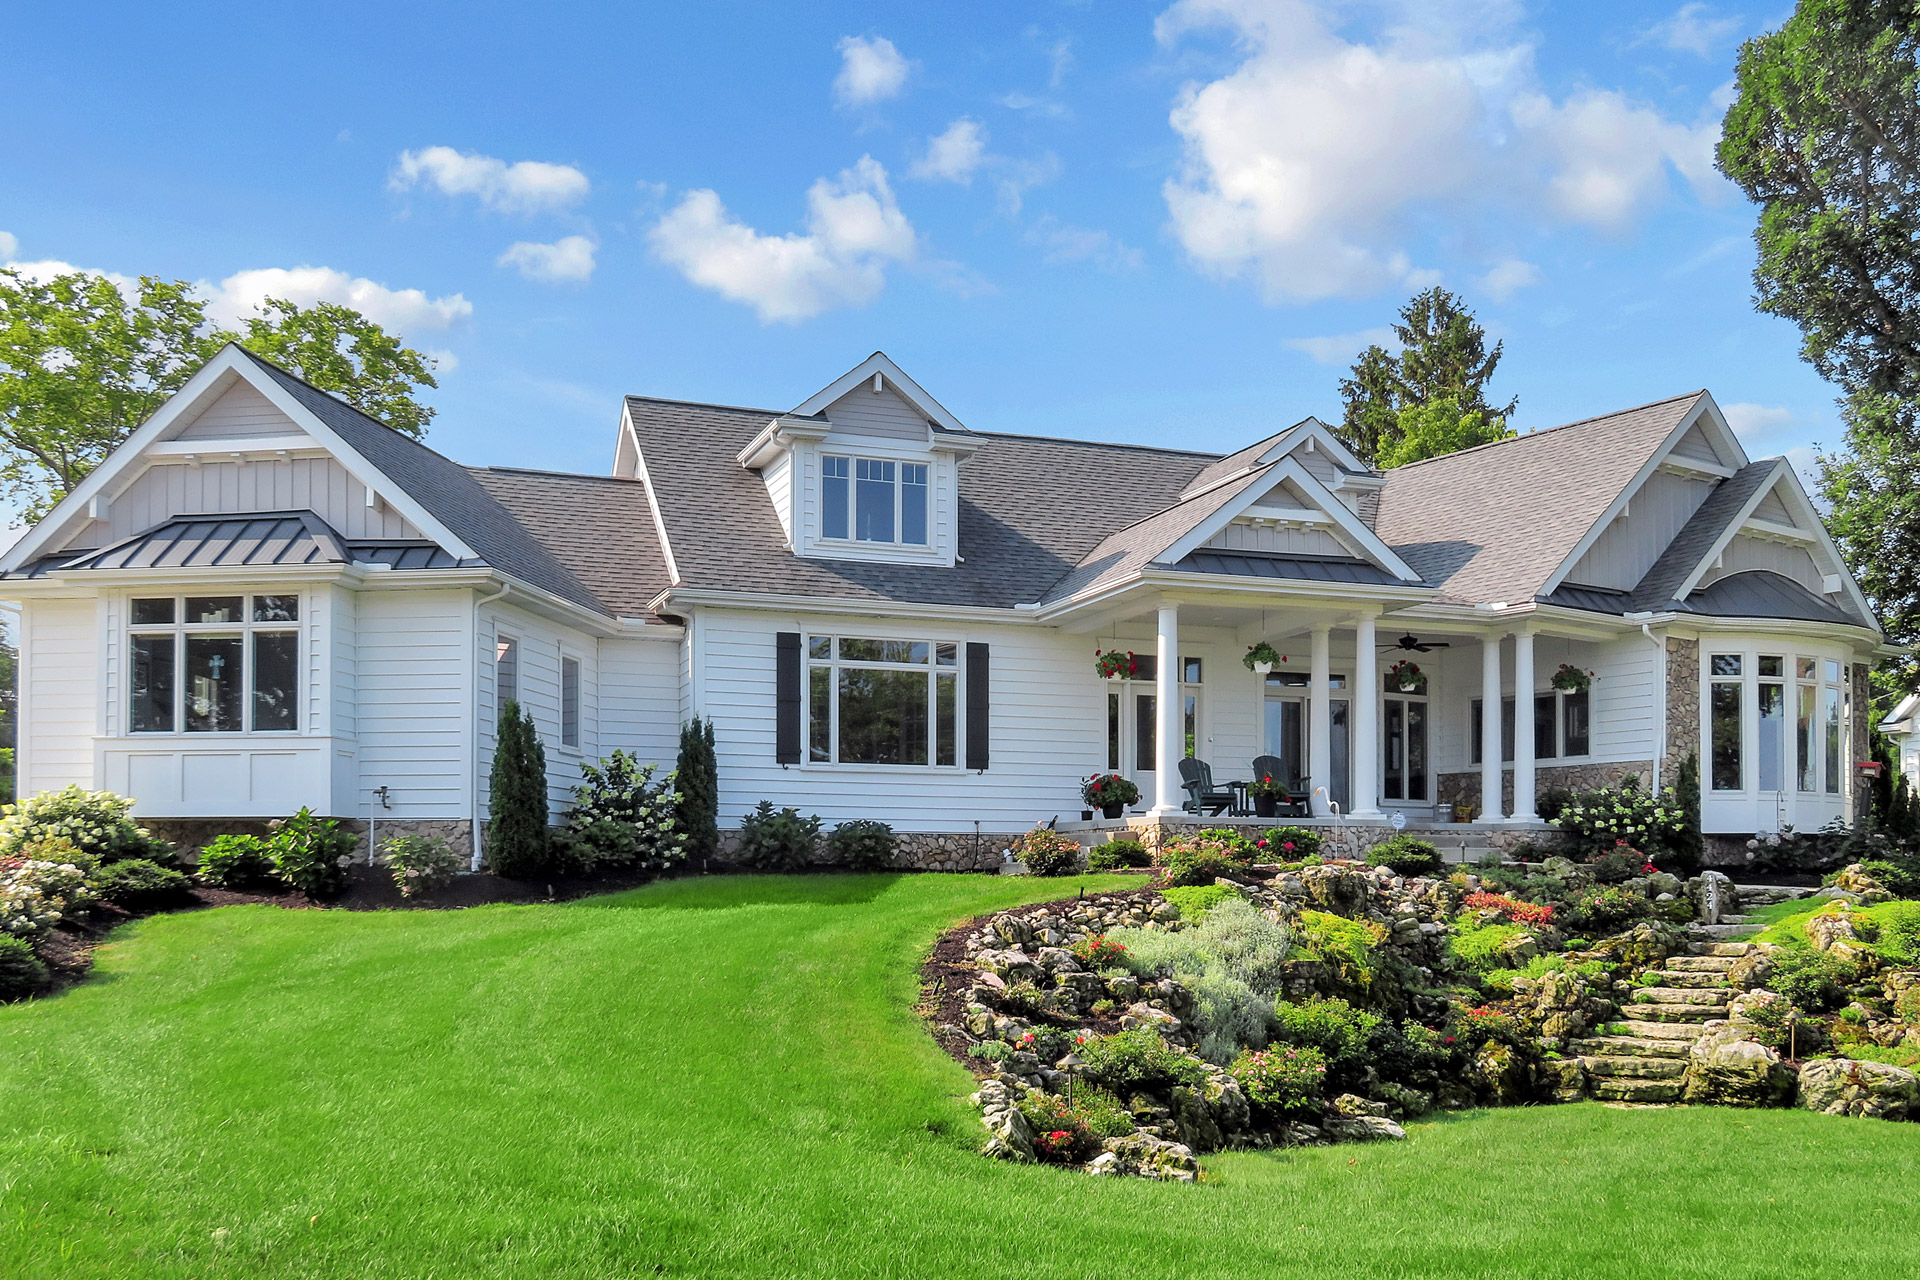 bolte real estate